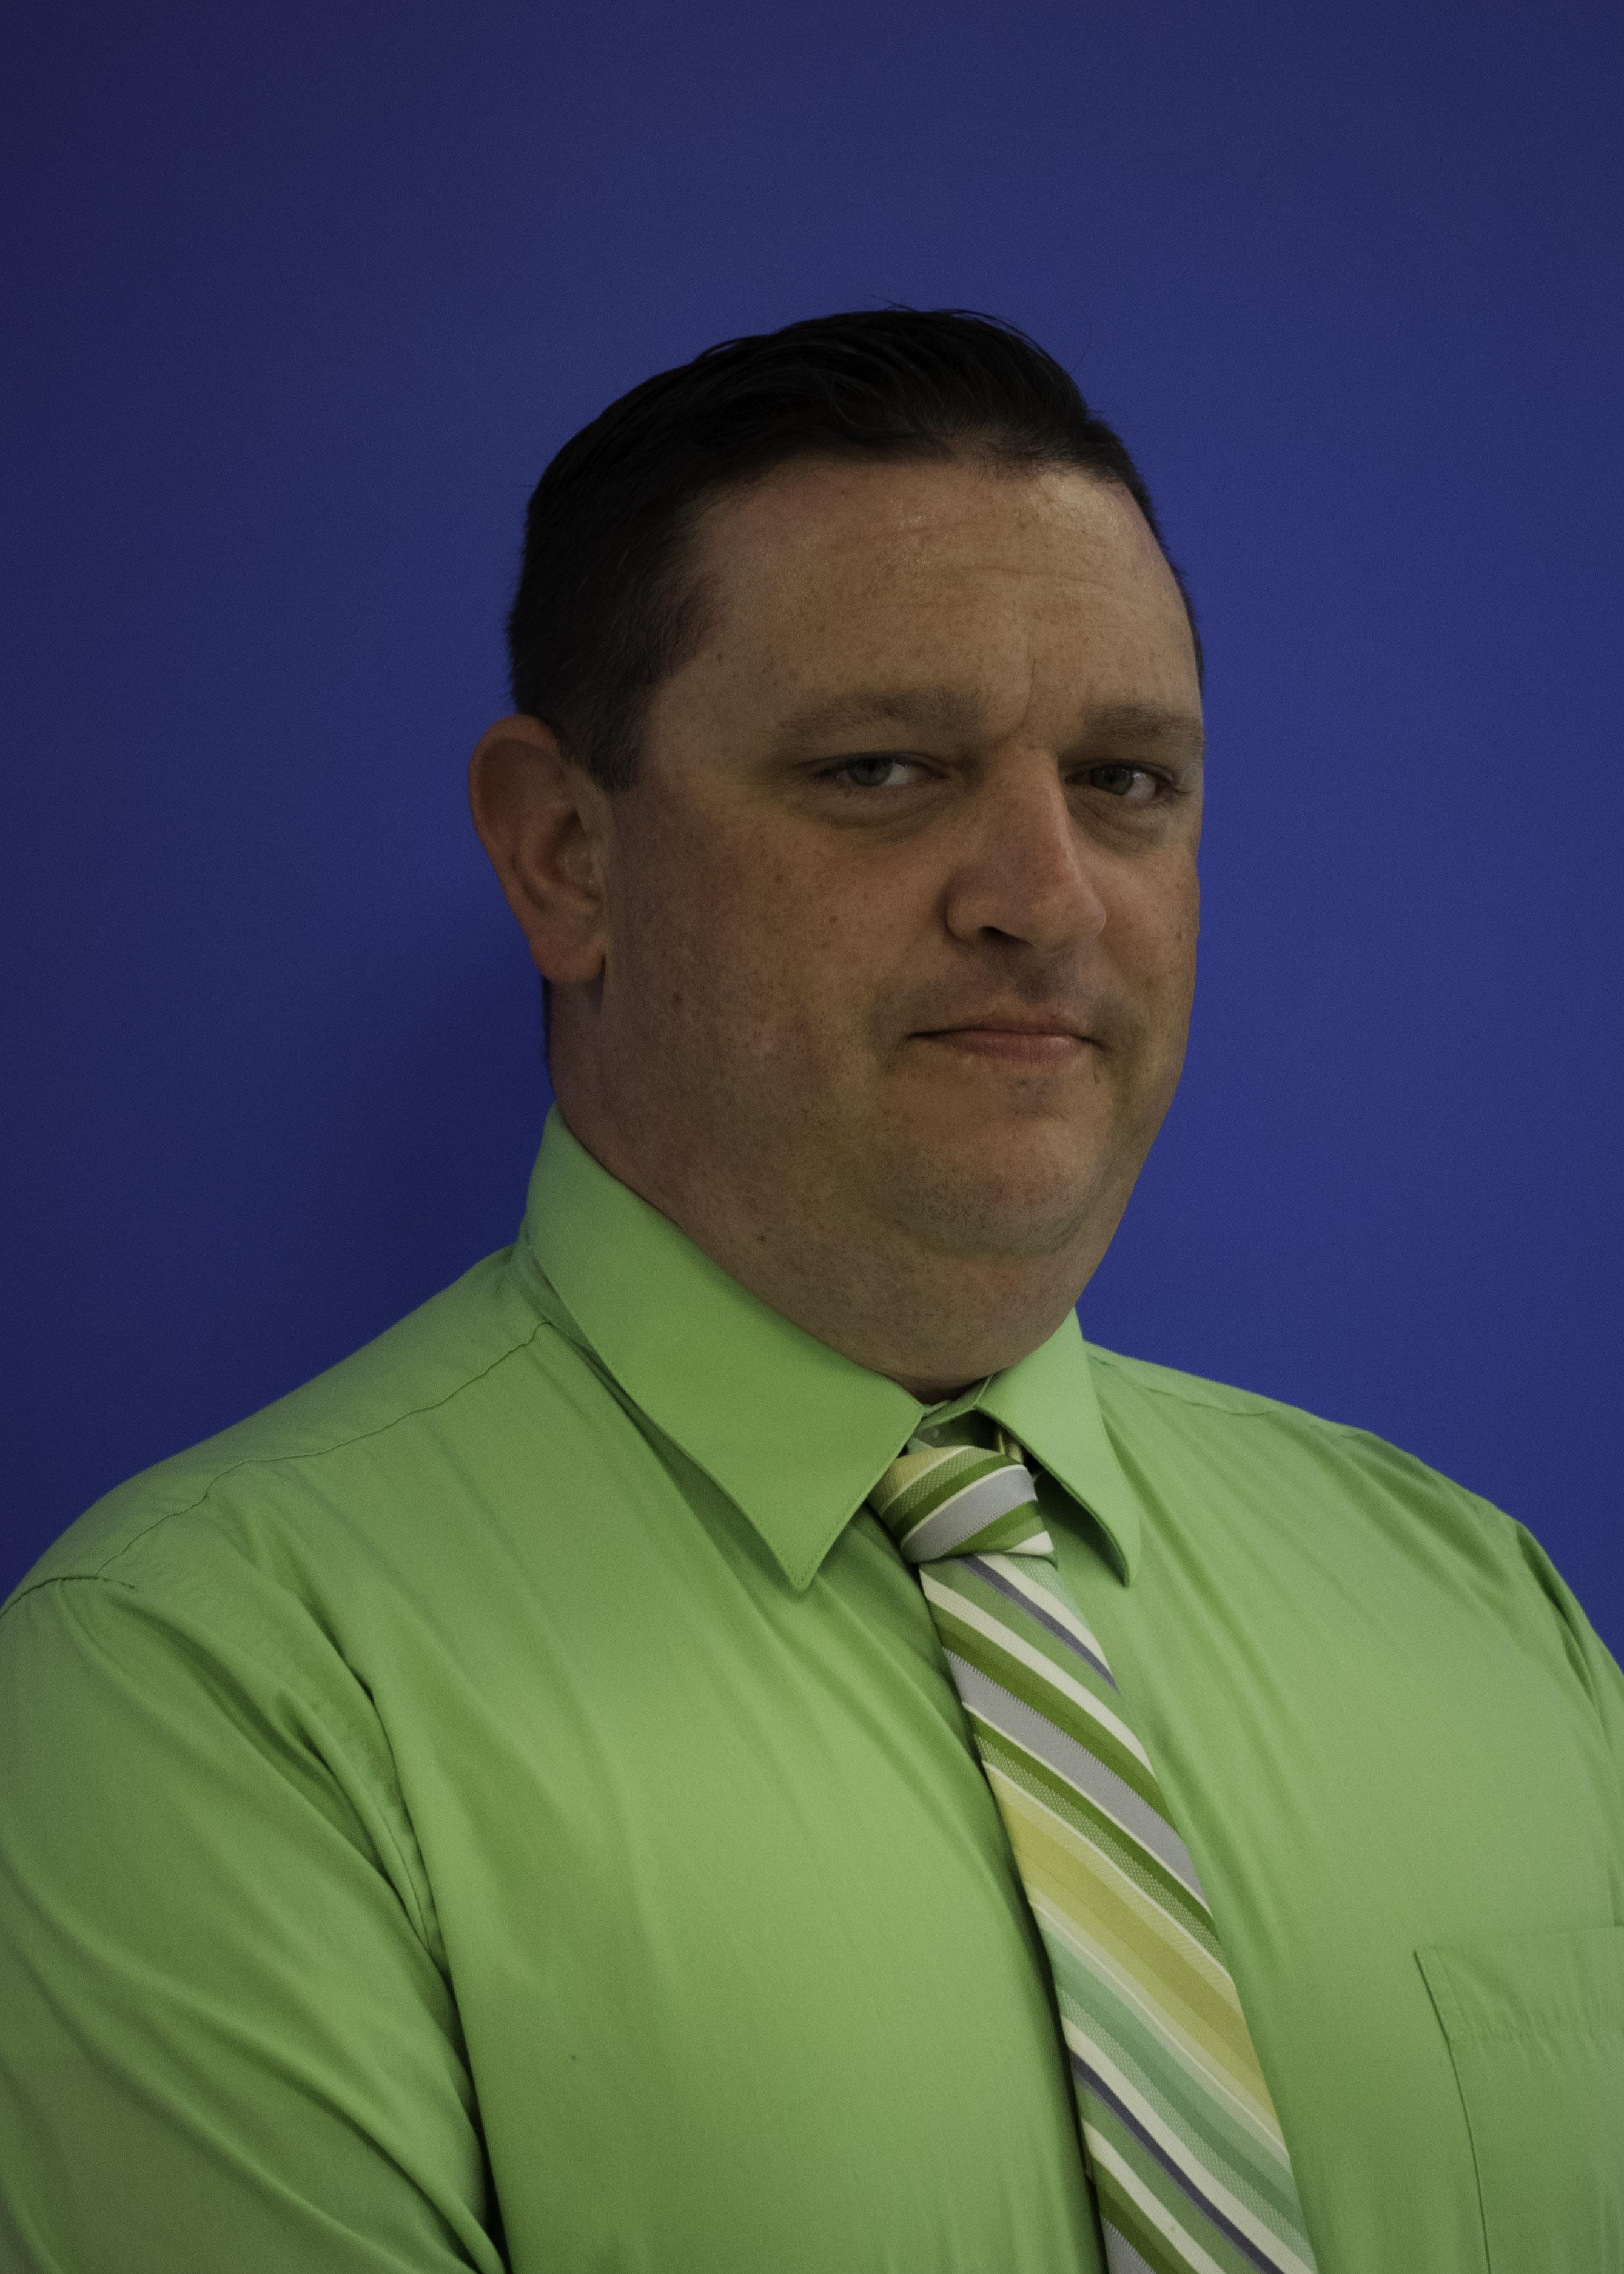 Jerad Miller Bio Image